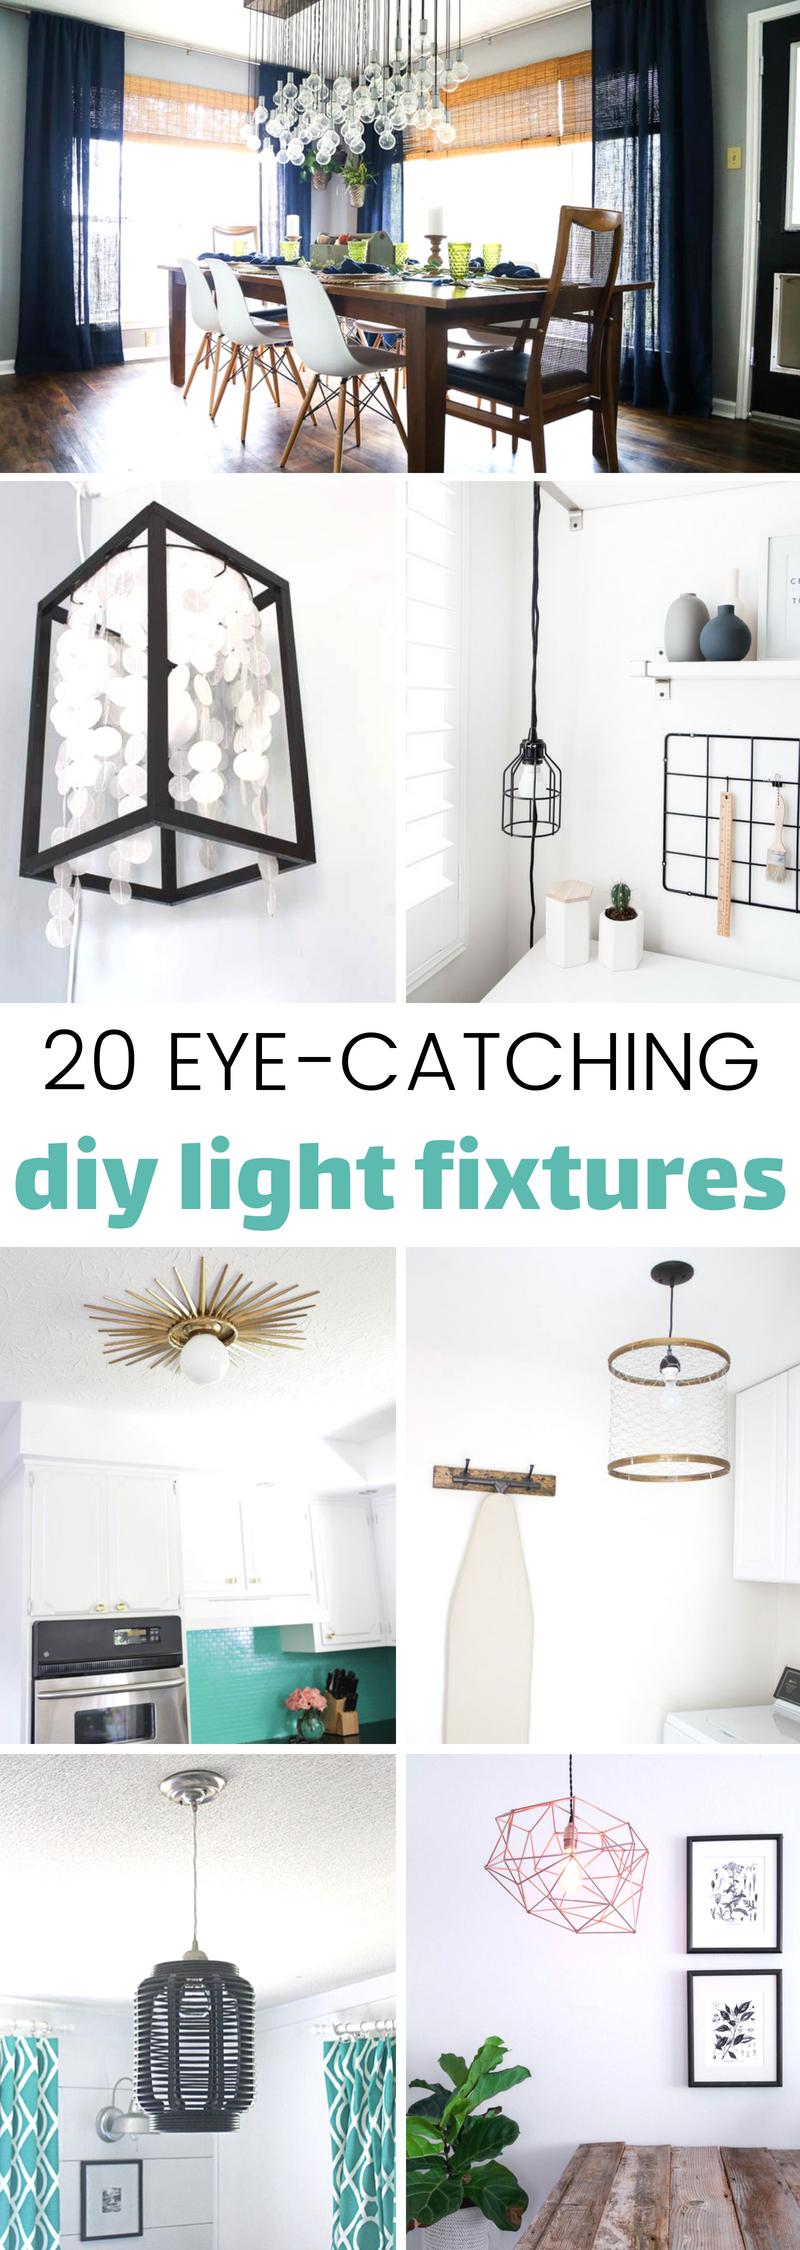 DIY Light Fixtures